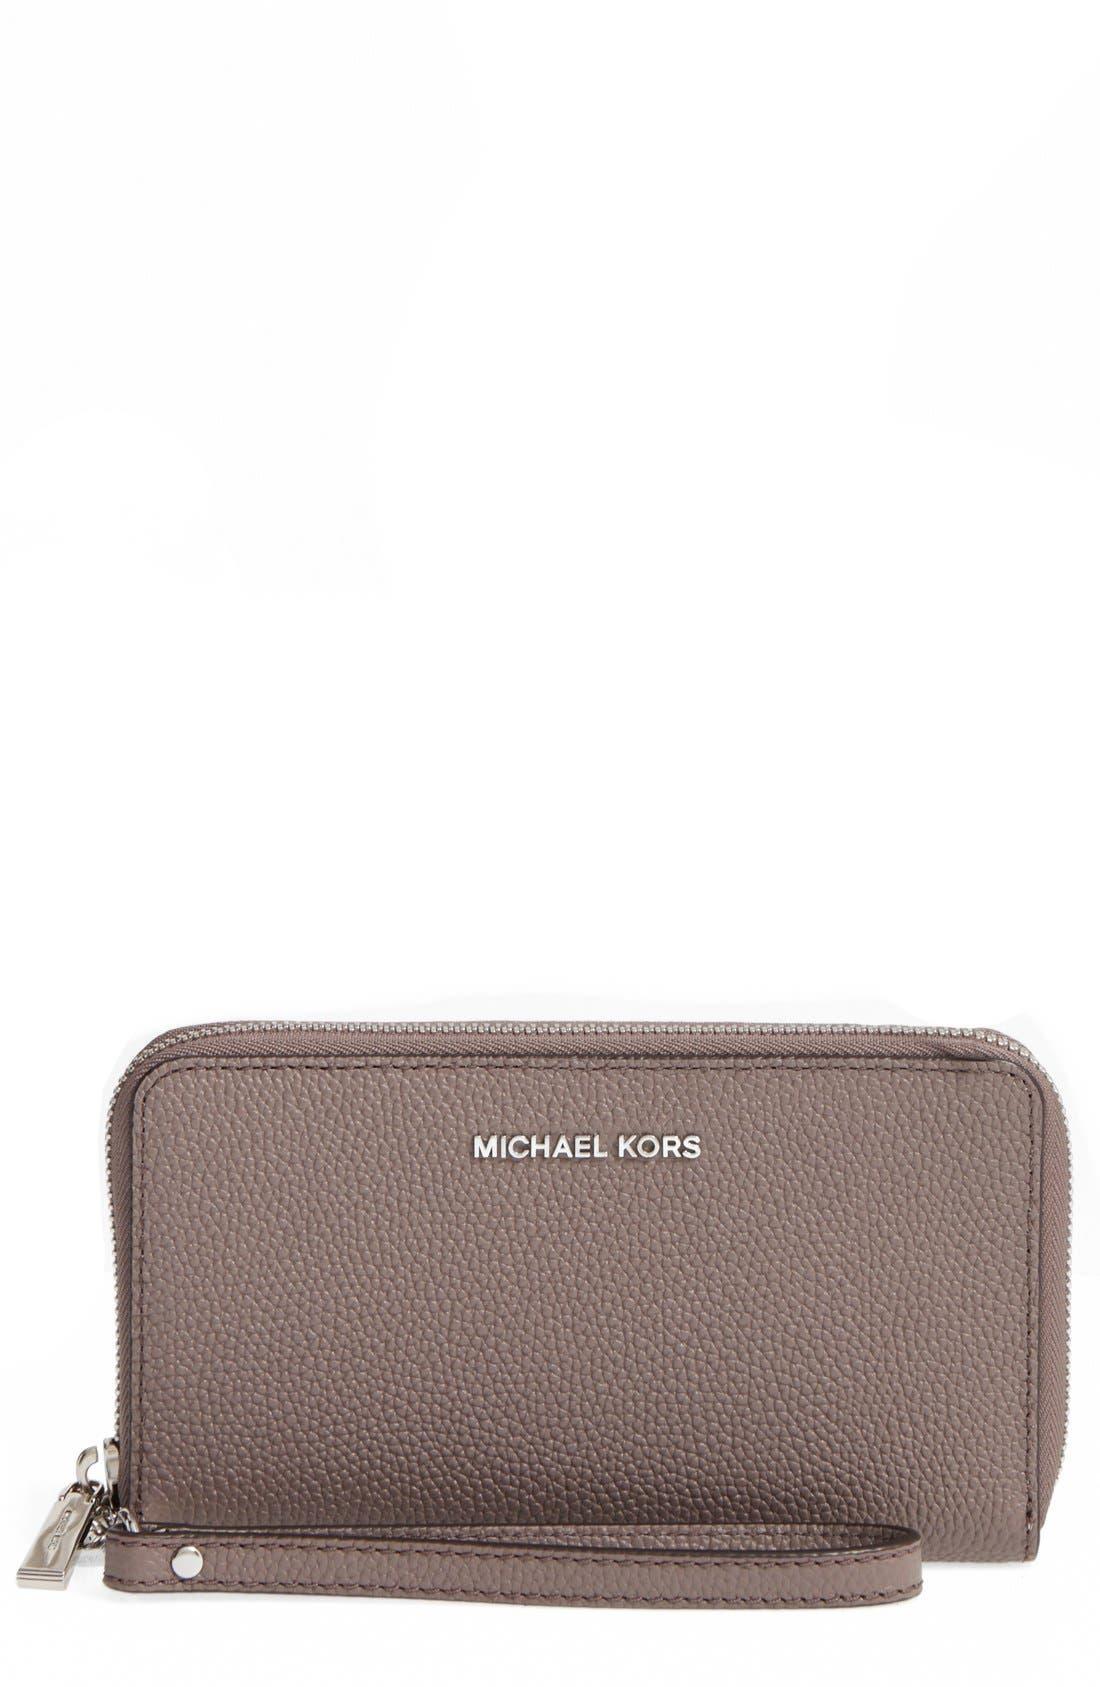 Mercer Large Leather Wristlet,                             Main thumbnail 4, color,